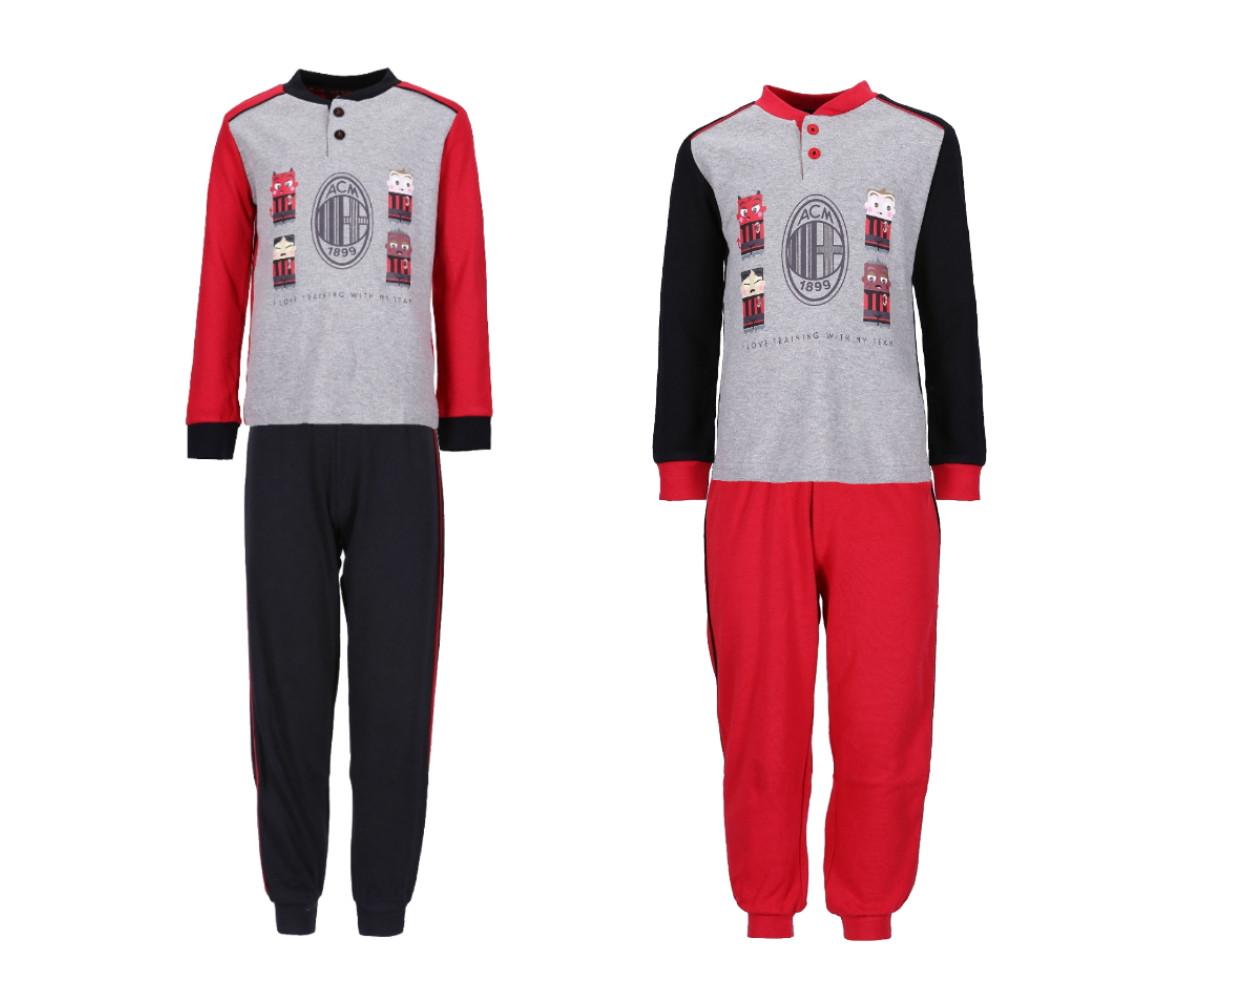 Pigiama Lungo Milan Bambino Abbigliamento Calcio ACM Milan PS 34793